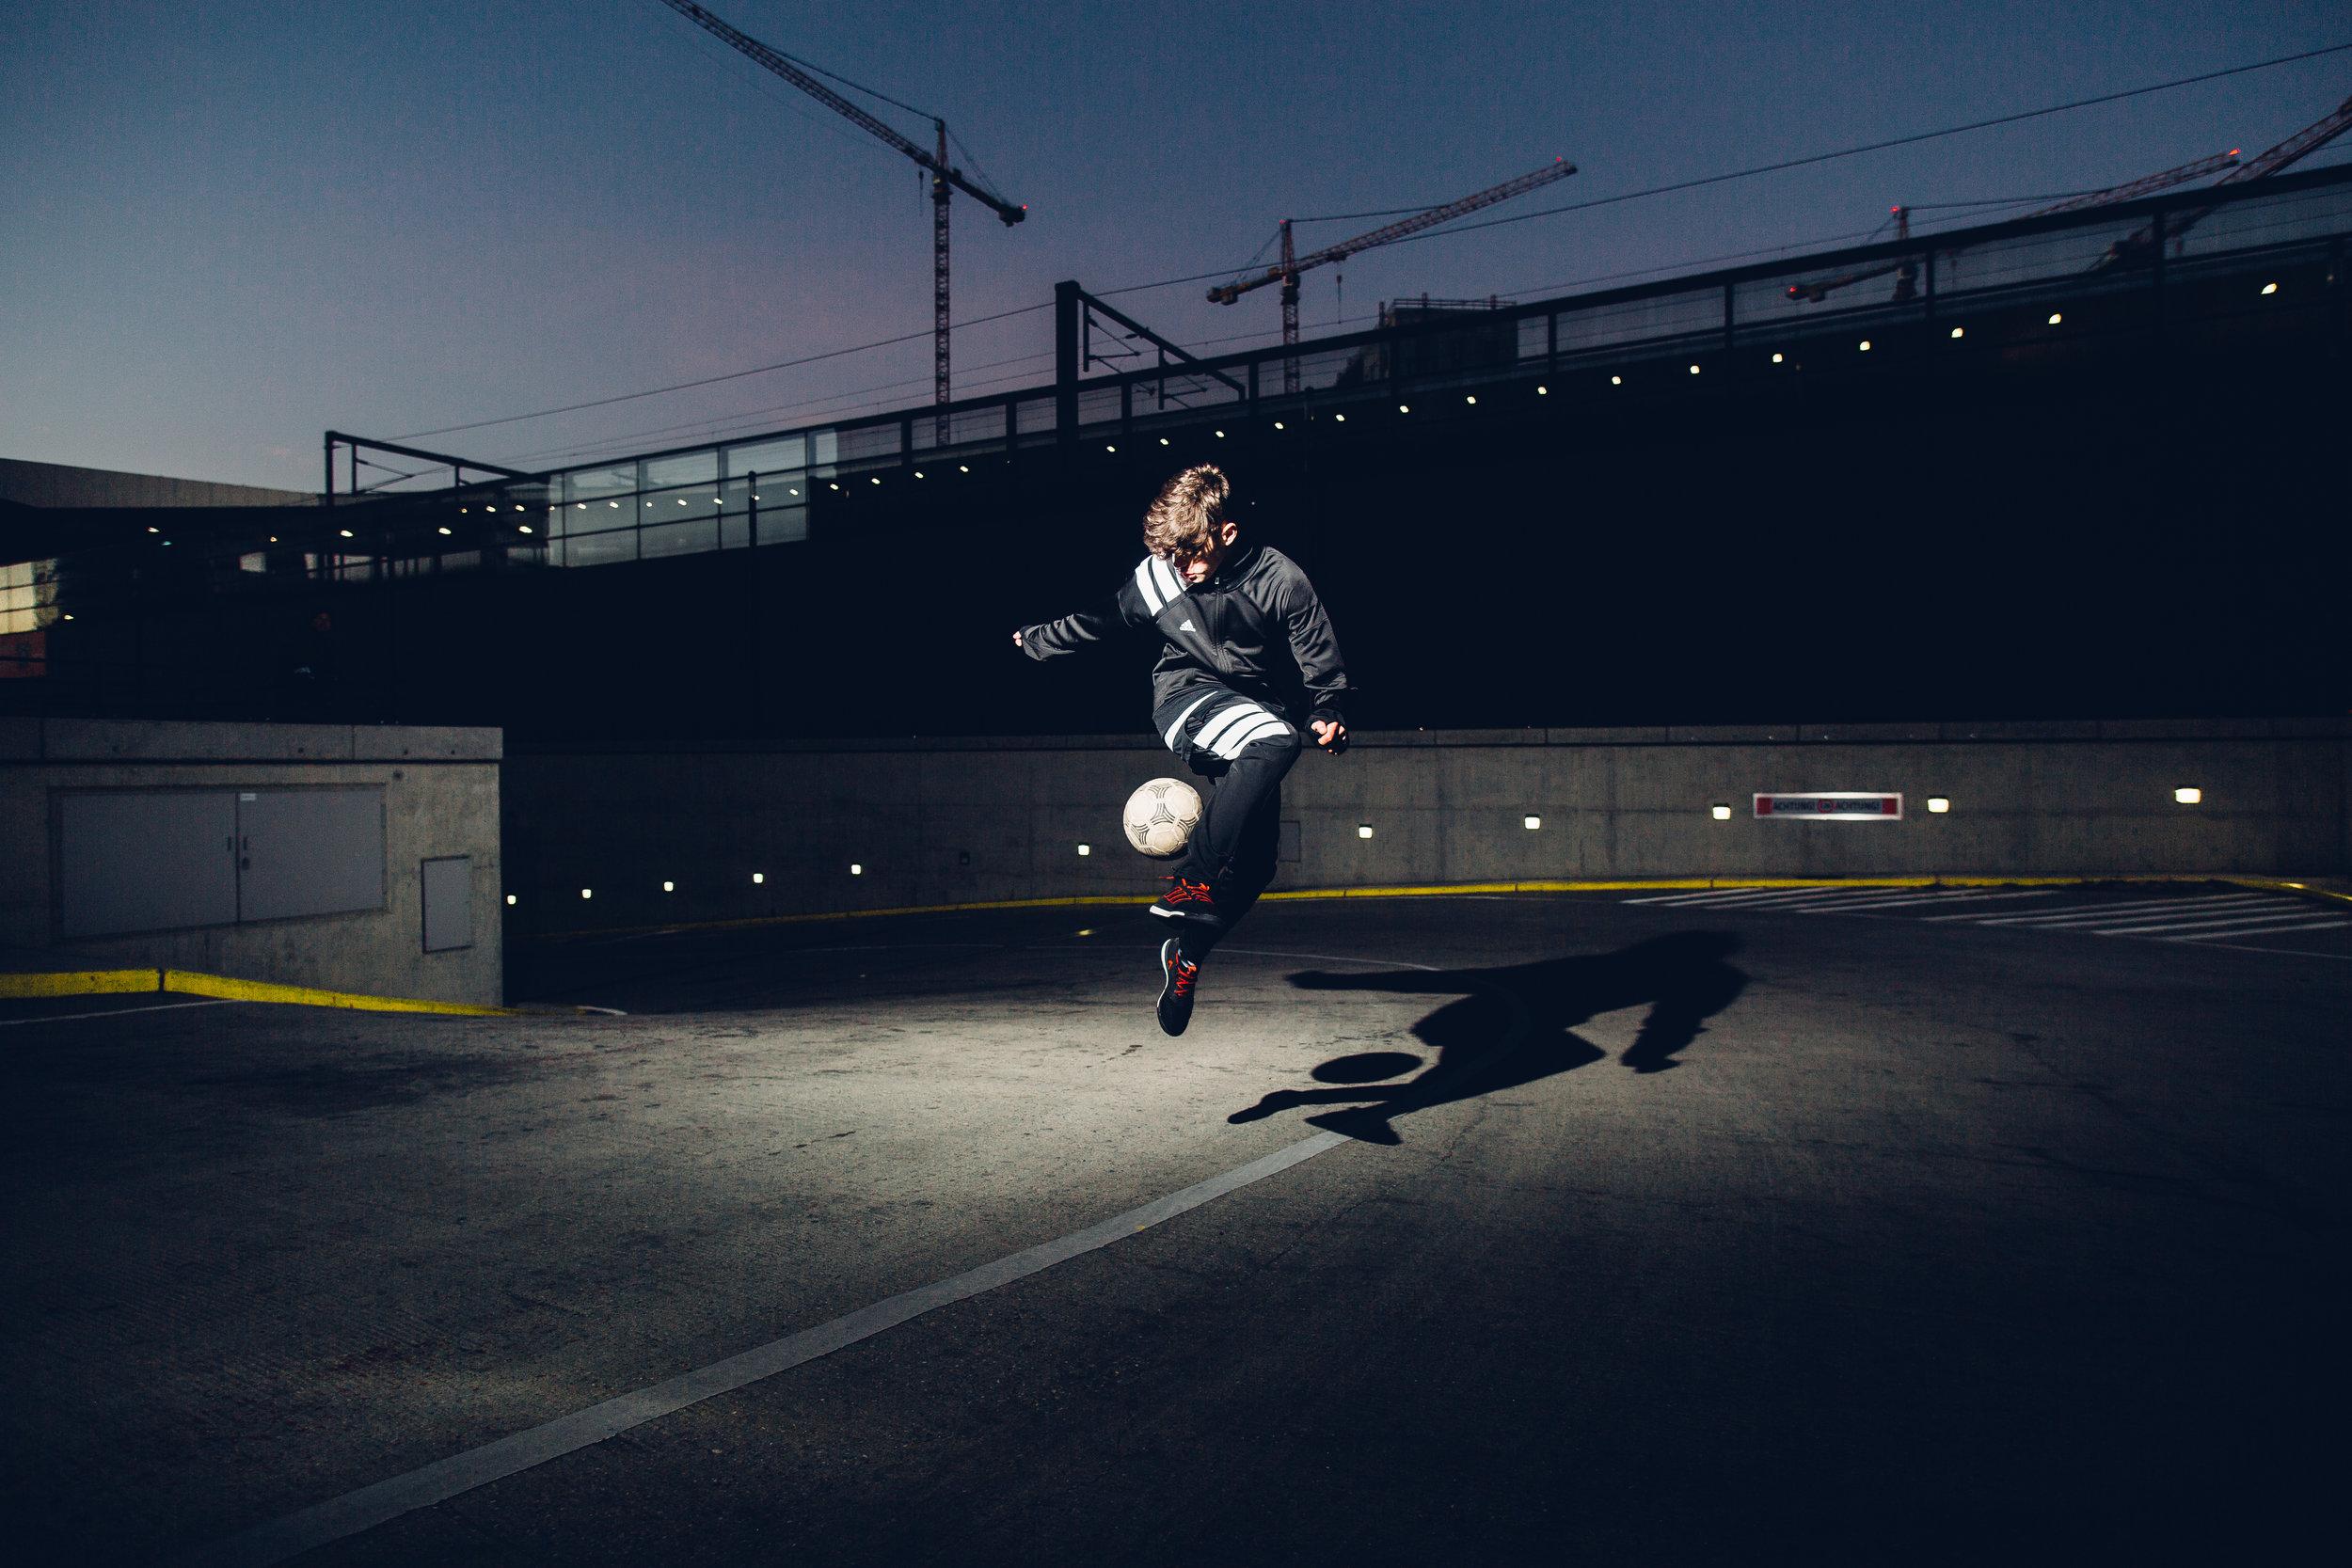 fotoshooting-wien-adidas-digitalagentur-constant-evolution.jpg